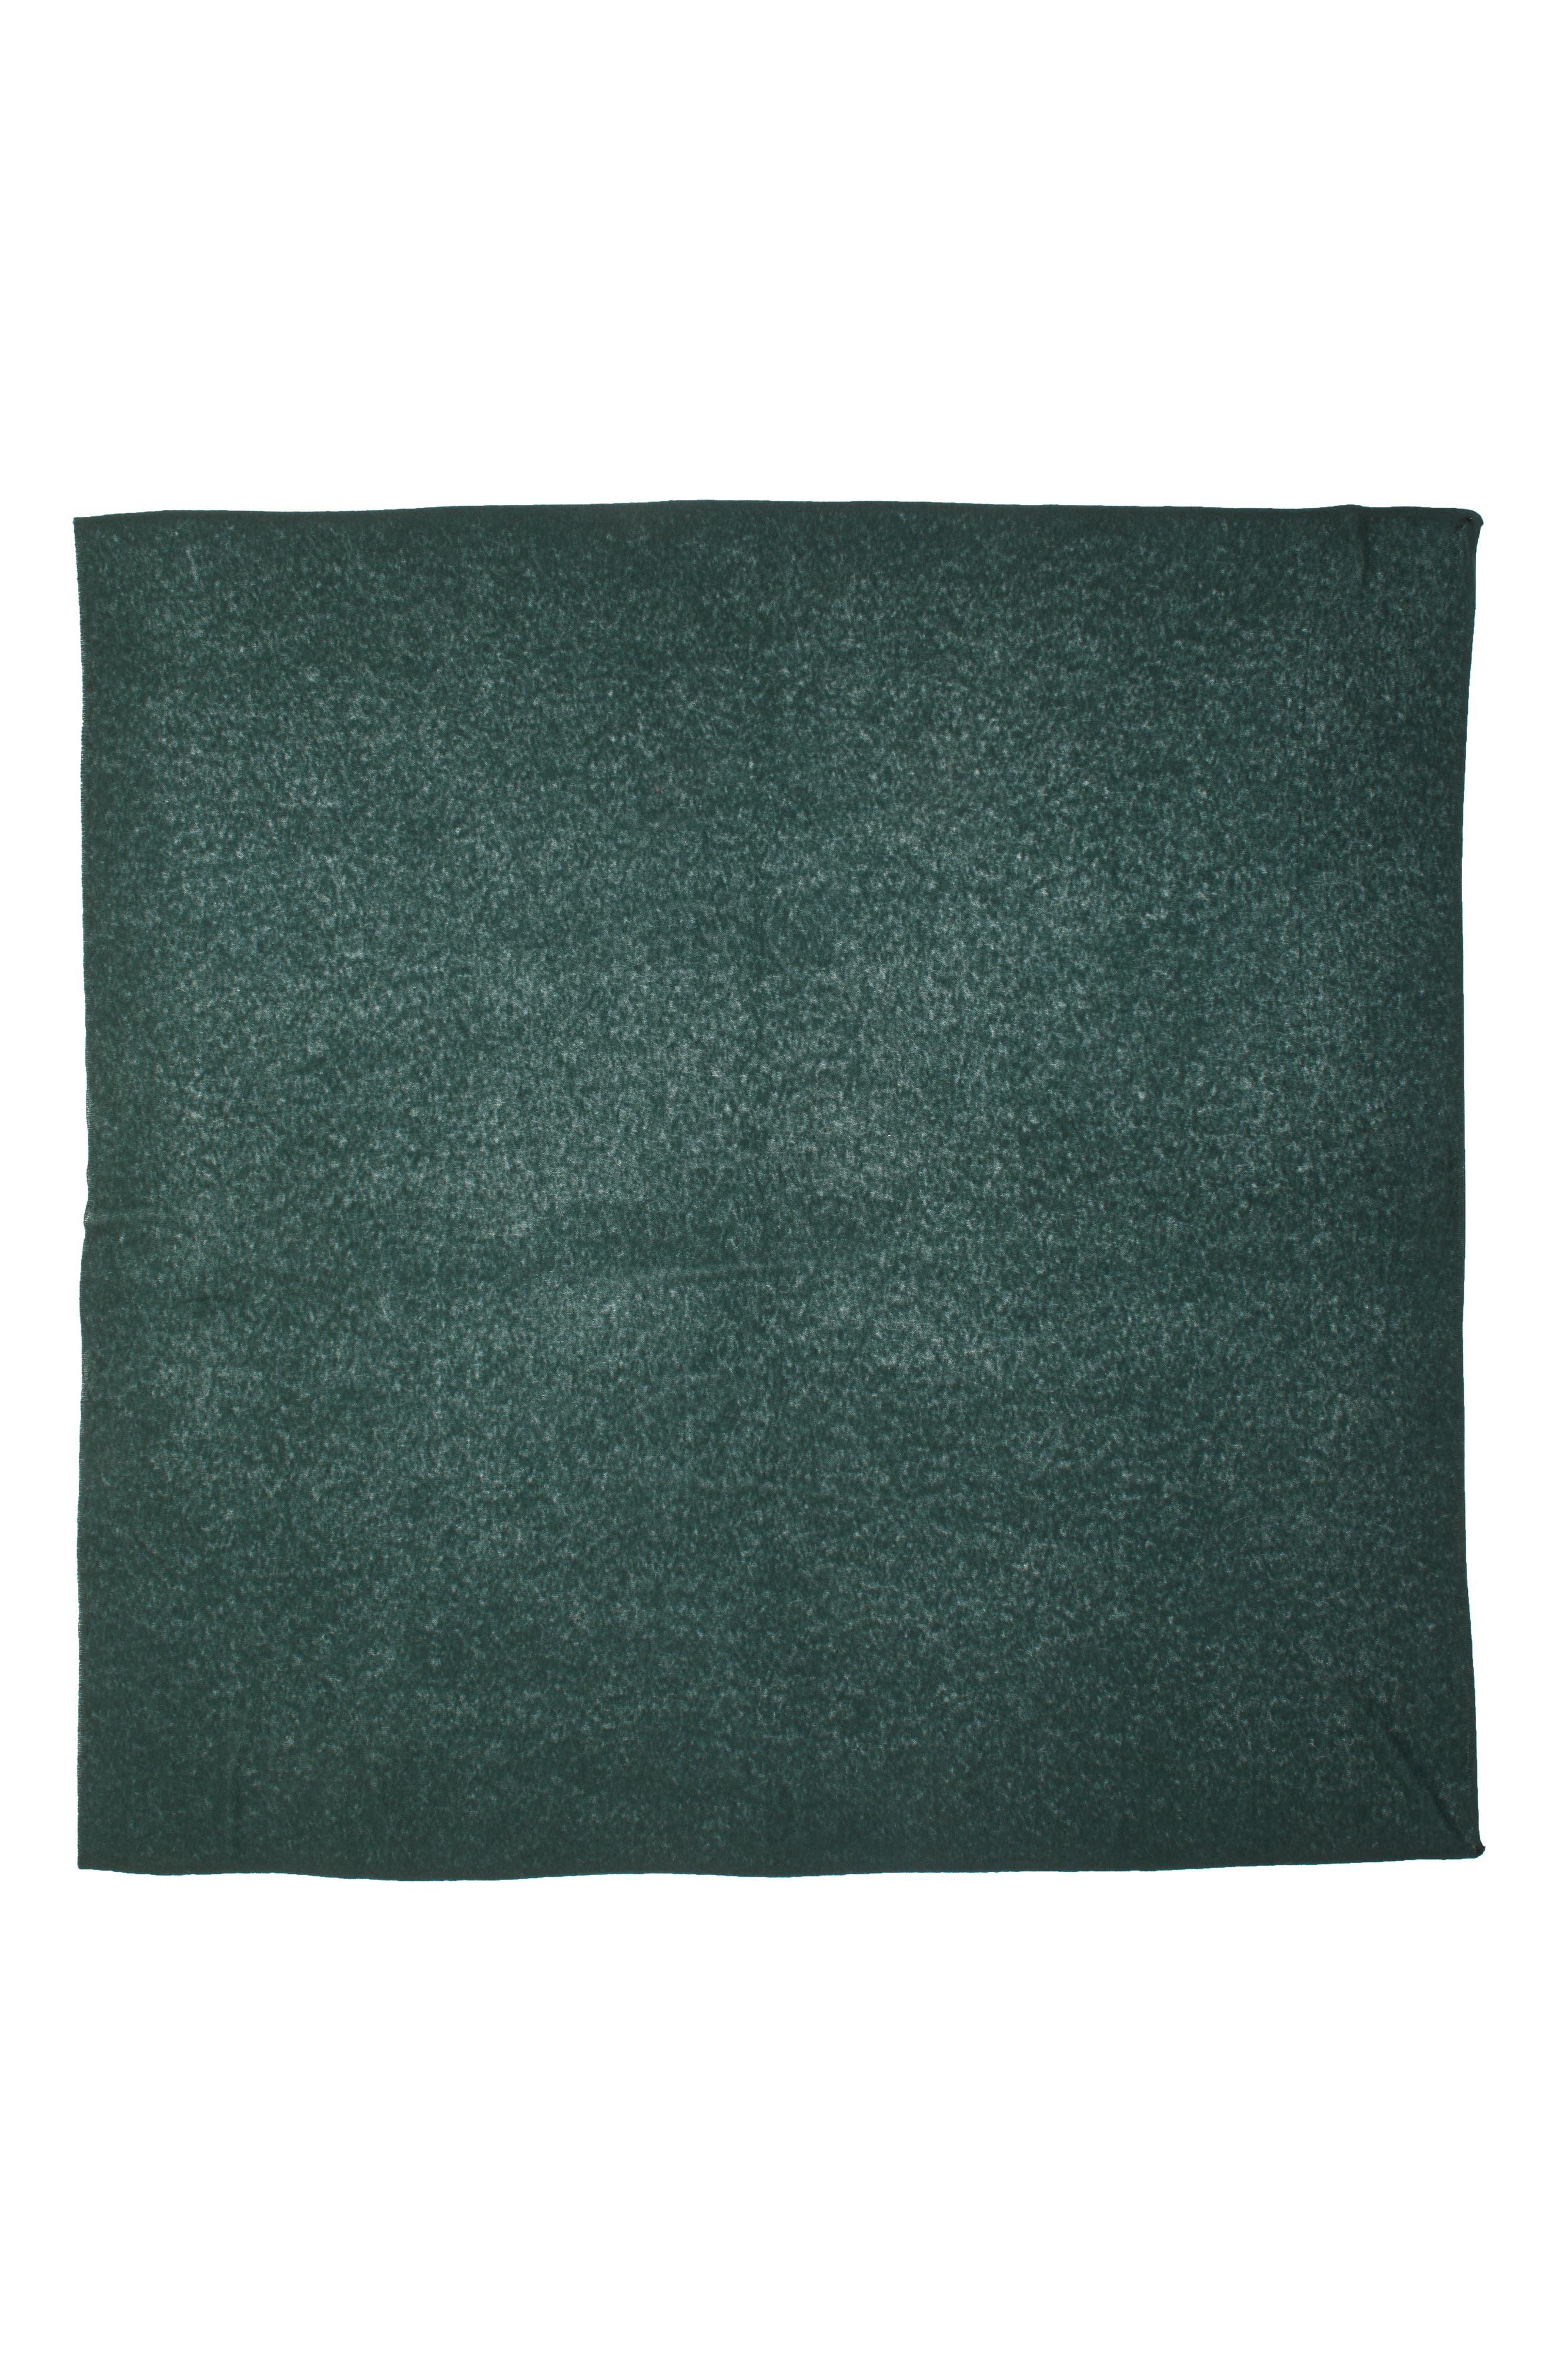 Cashmere Scarf,                             Alternate thumbnail 3, color,                             GREEN PONDEROSA